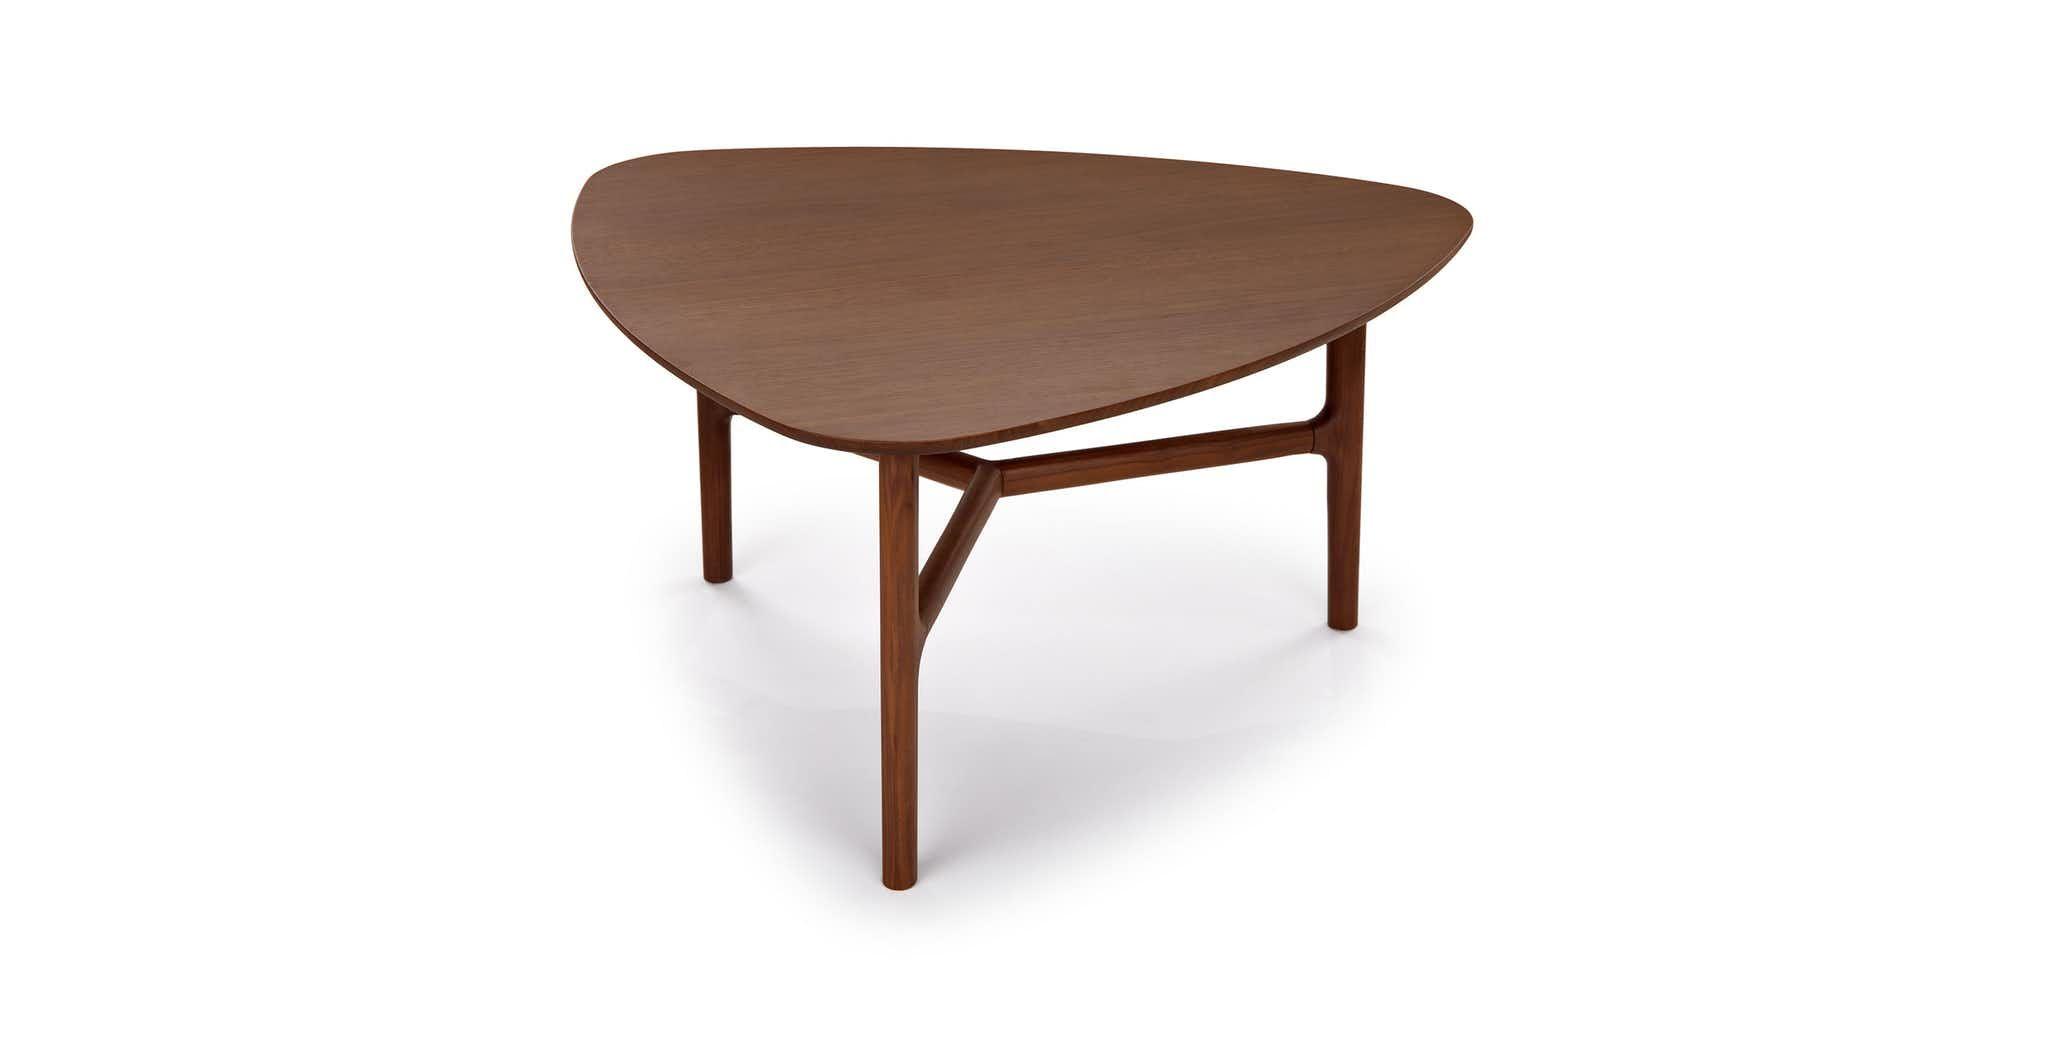 Brezza Matte Walnut Triangular Coffee Table In 2021 Coffee Table Table Modern Coffee Tables [ jpg ]